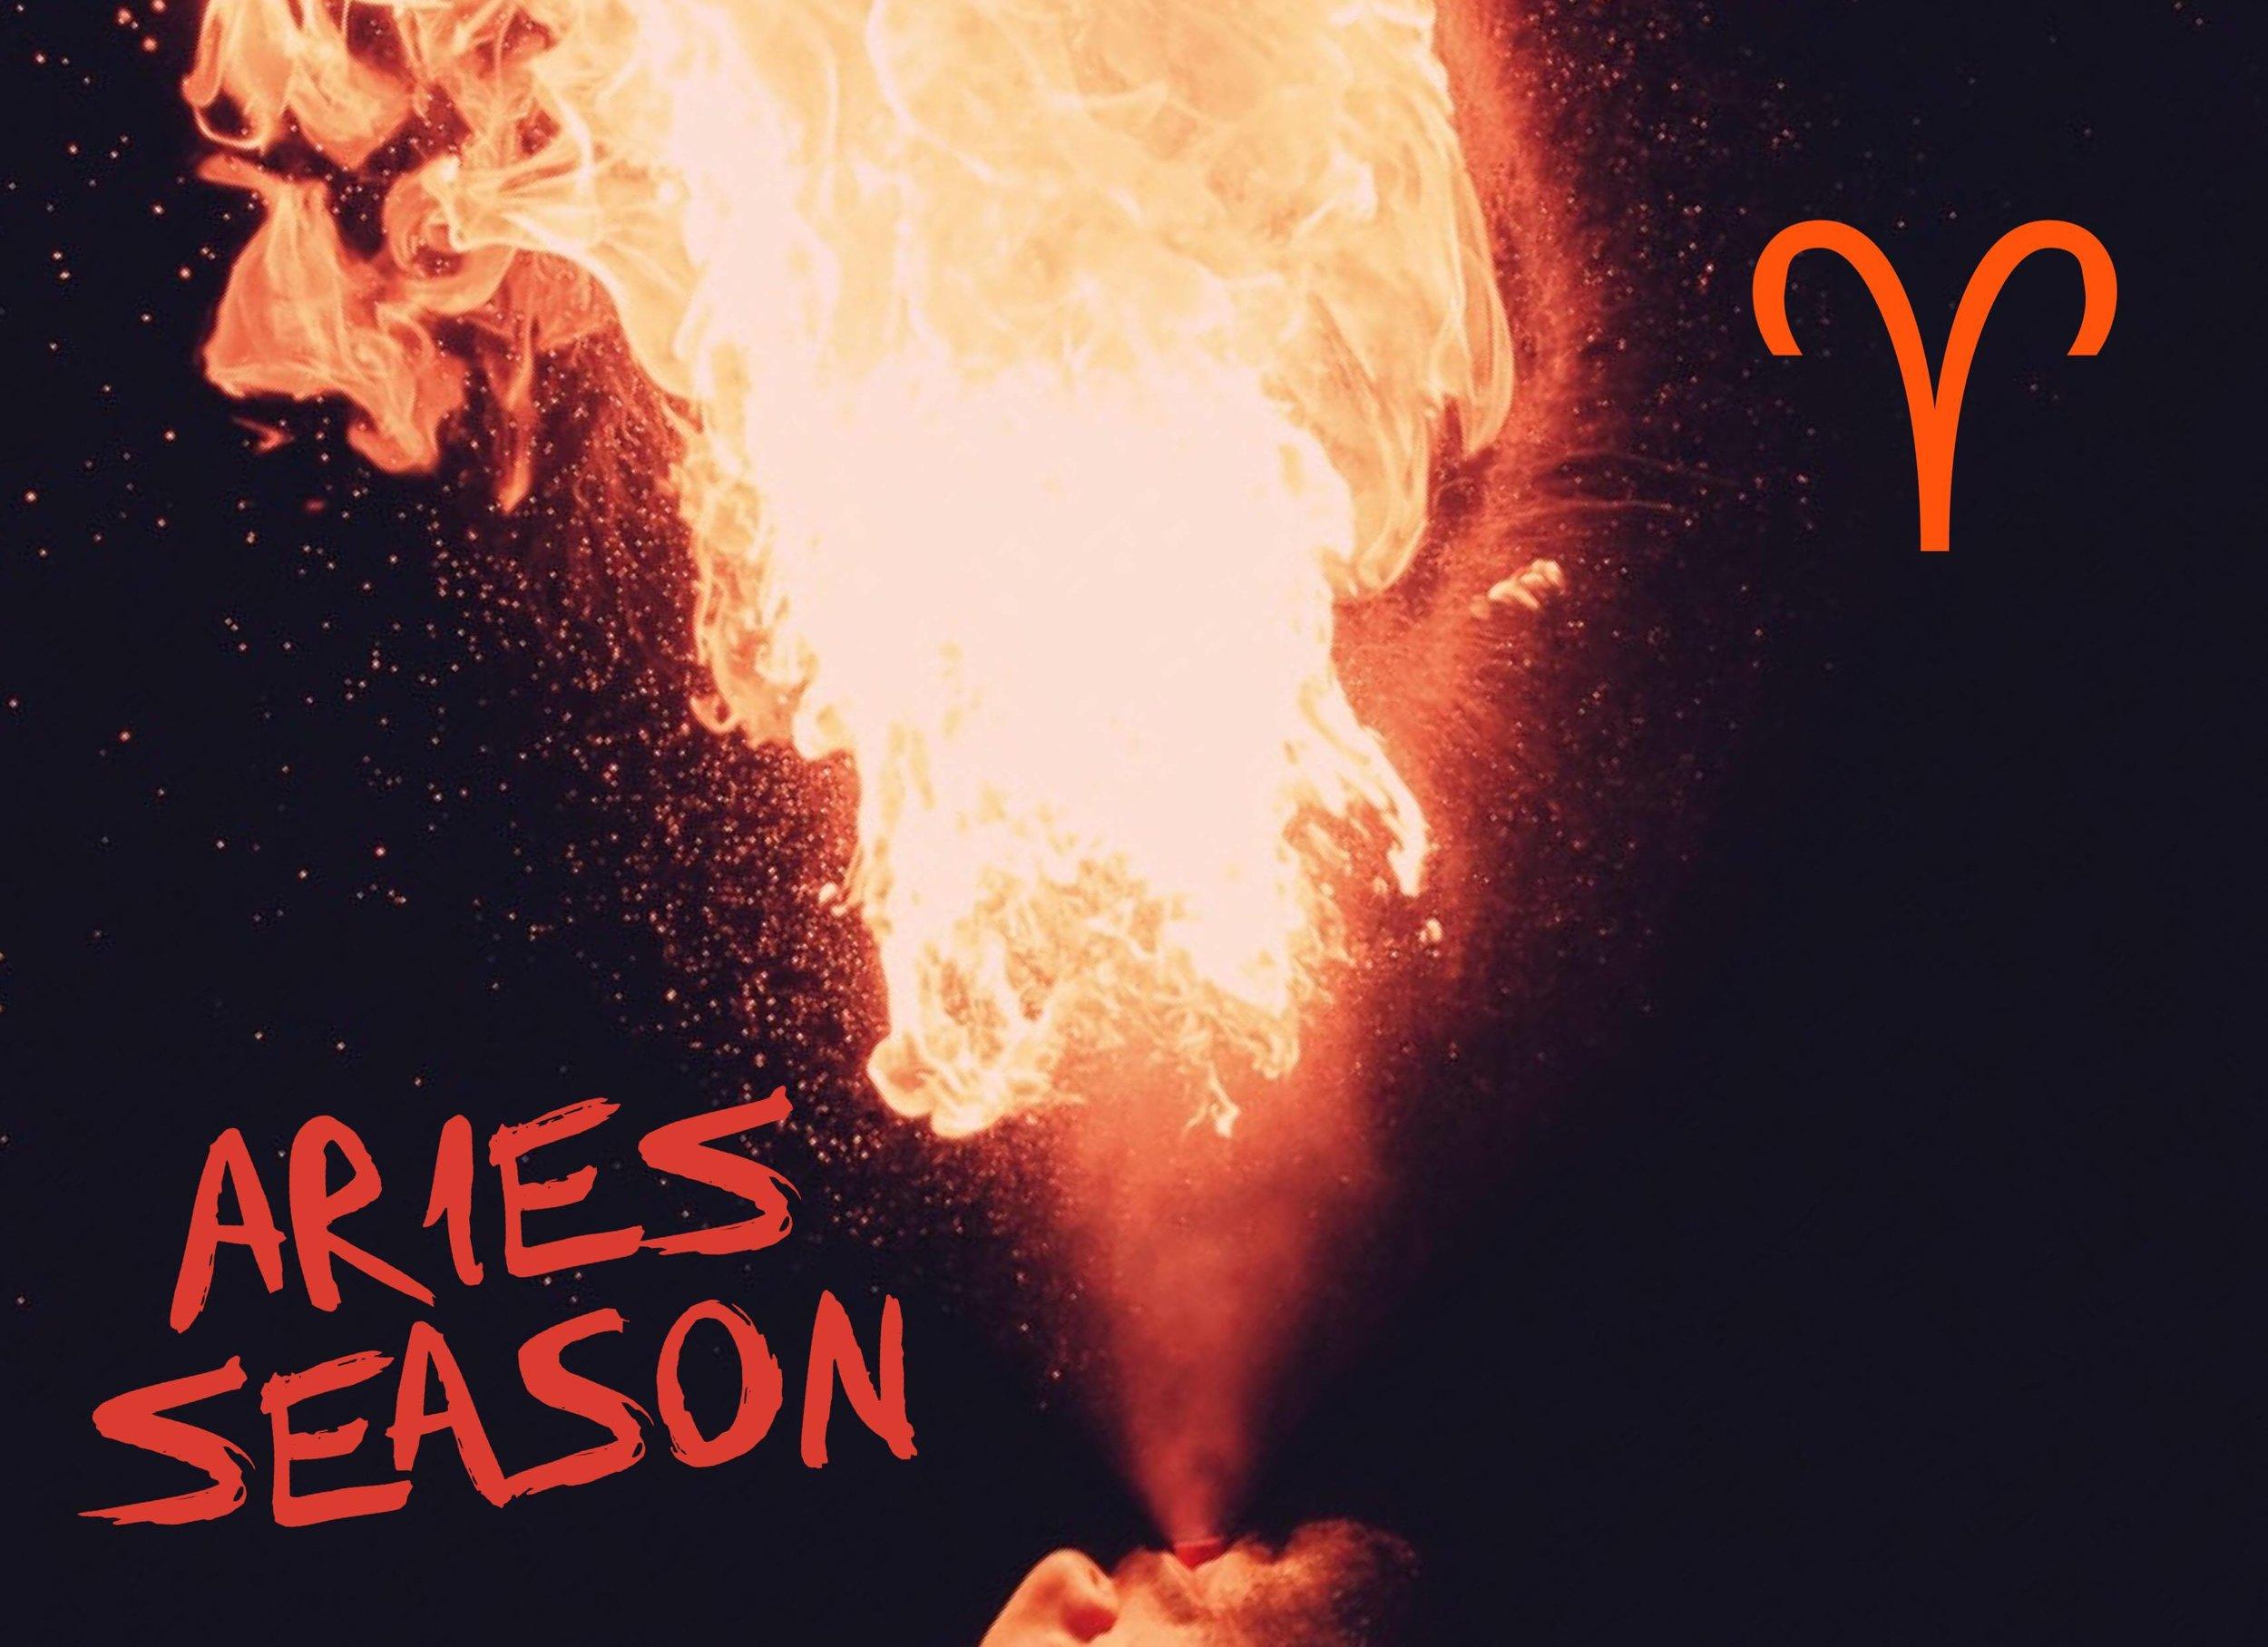 aries season leoaqualibravibes online blog what is aries season